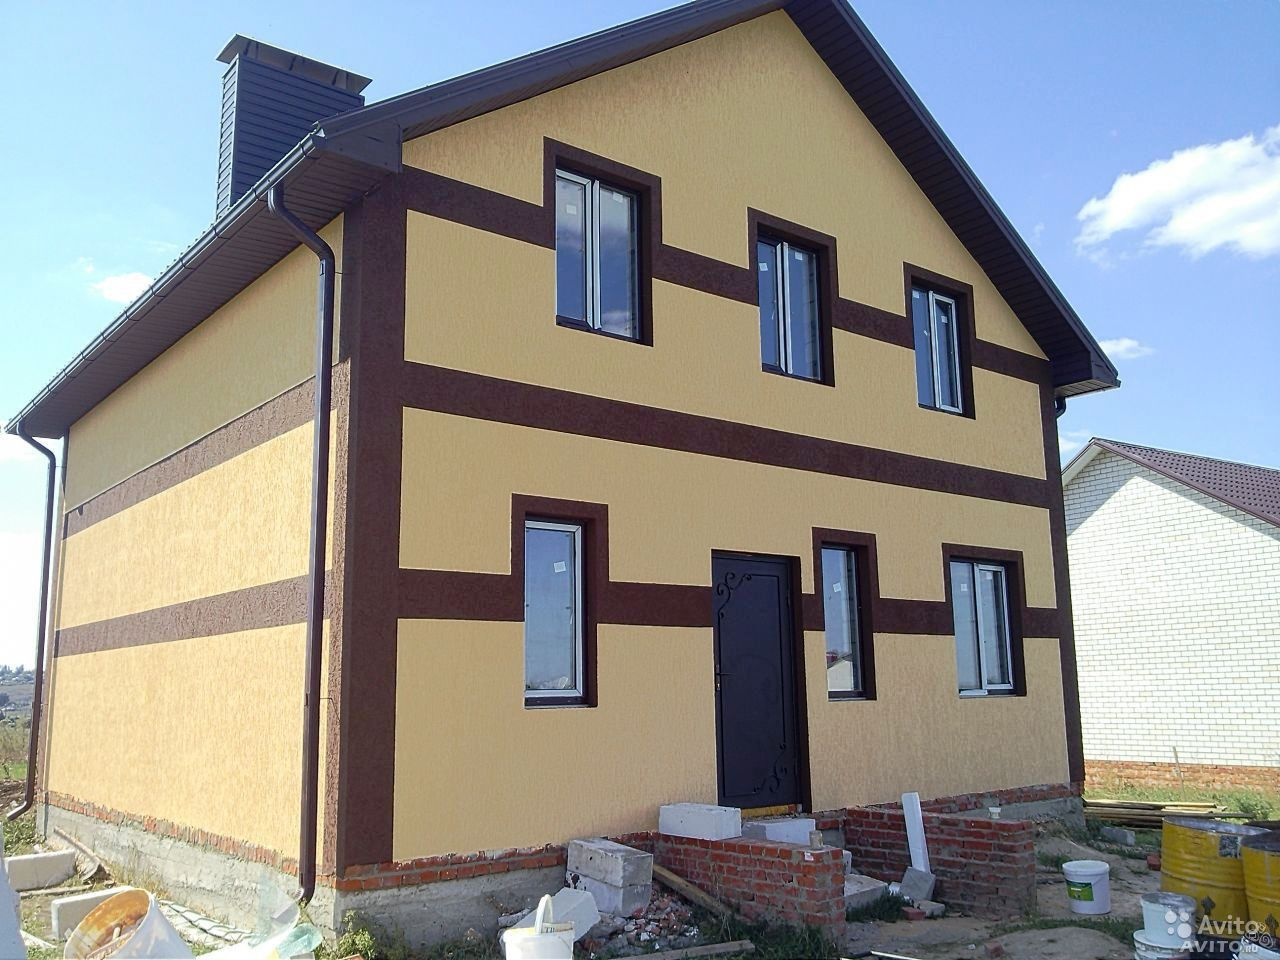 Как покрасить фасад дома своими руками : фото, подготовка фасада 85